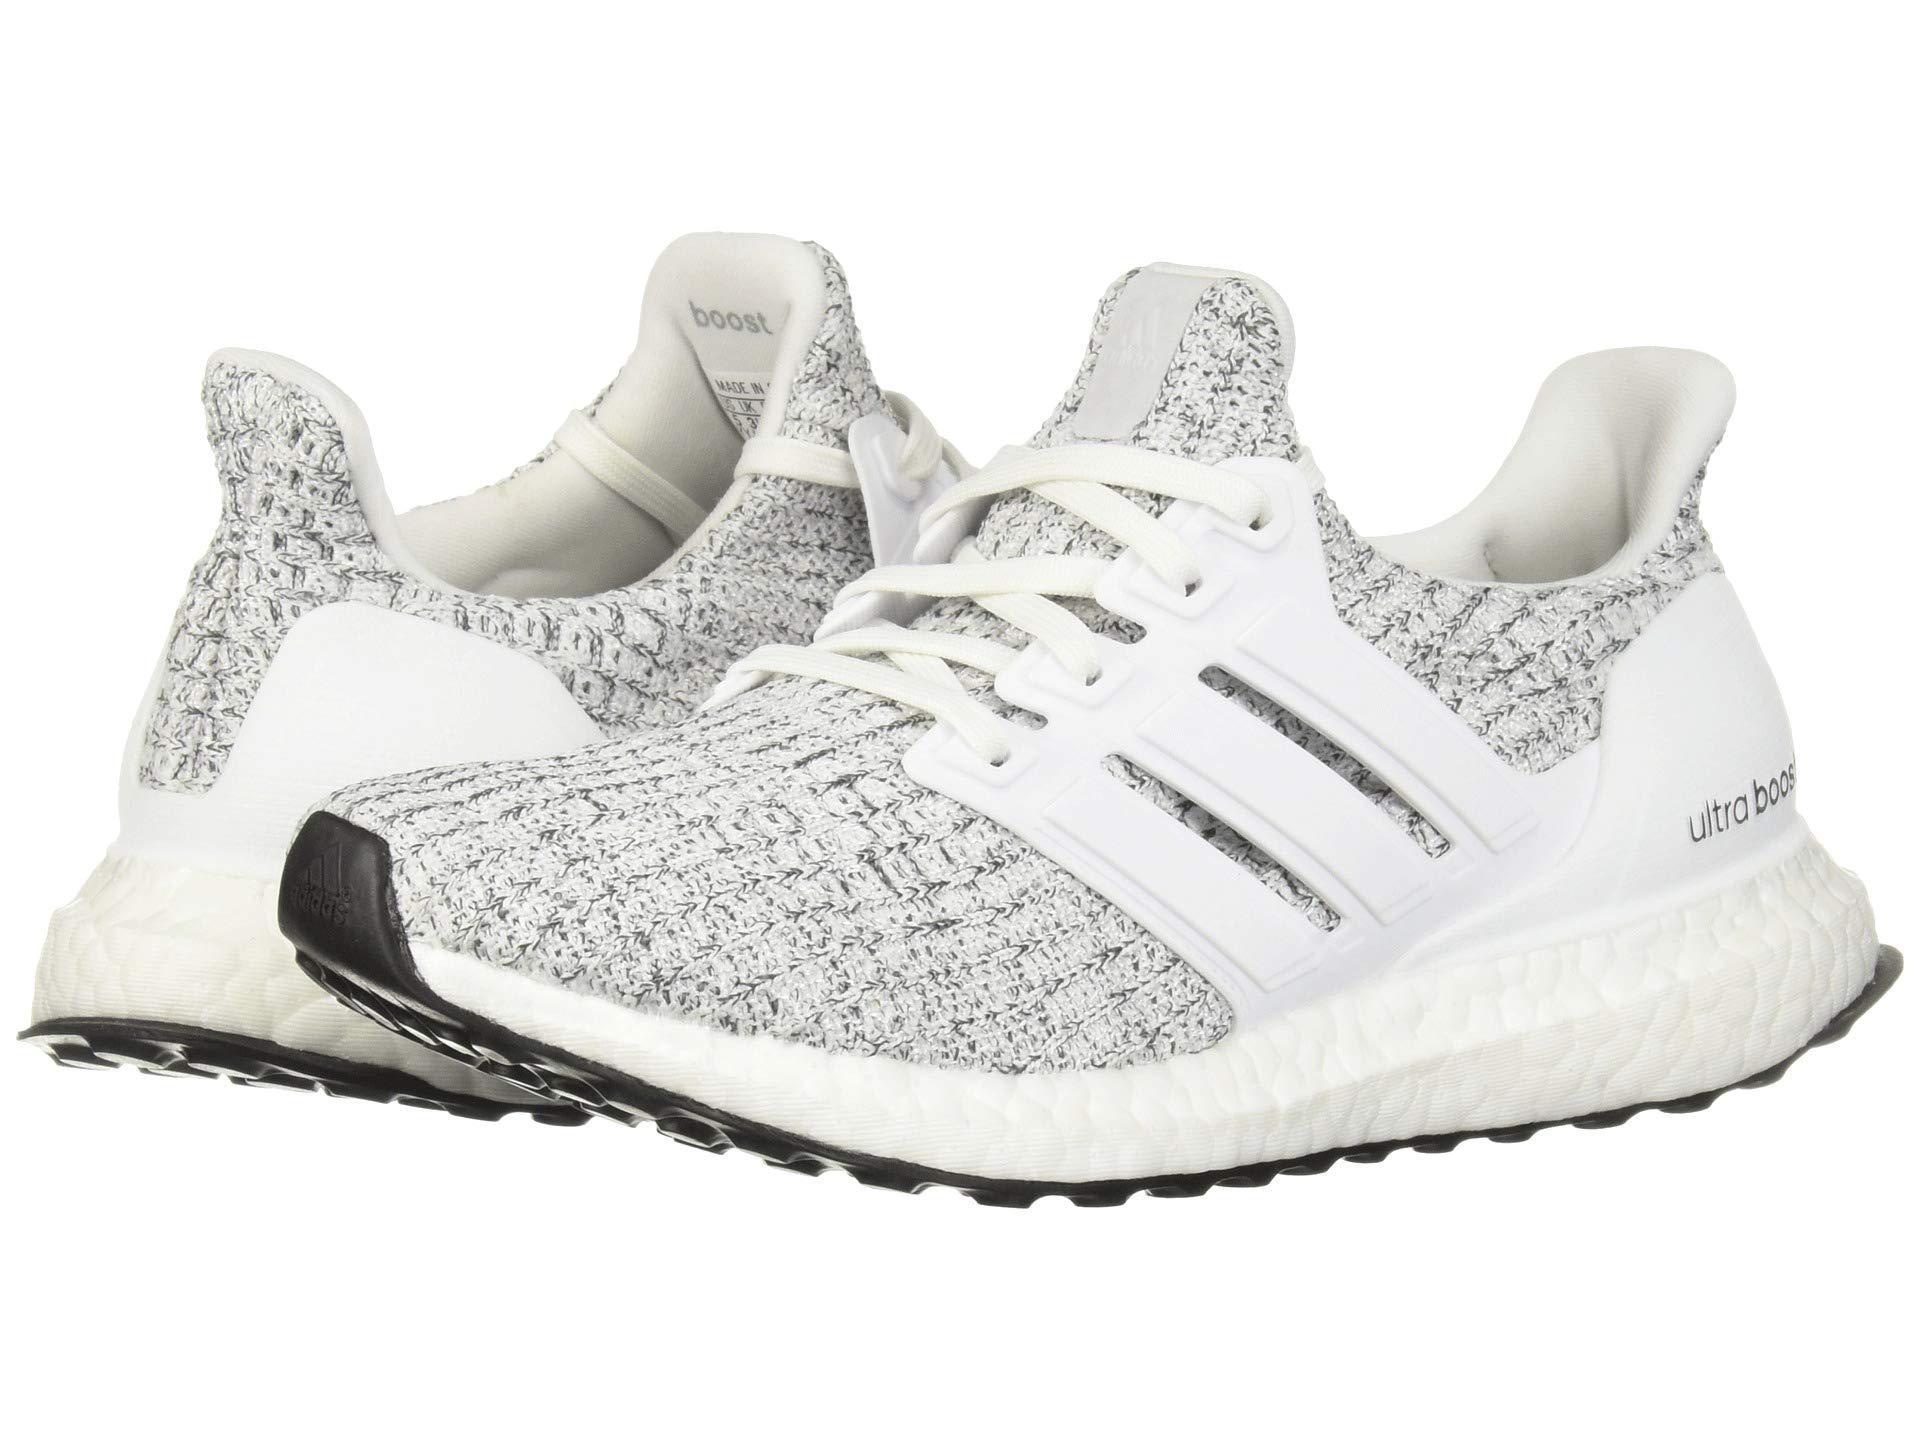 half off 03c9d 1de6c adidas Originals. White Ultraboost (ash Pearlash Pearl) Womens Running  Shoes